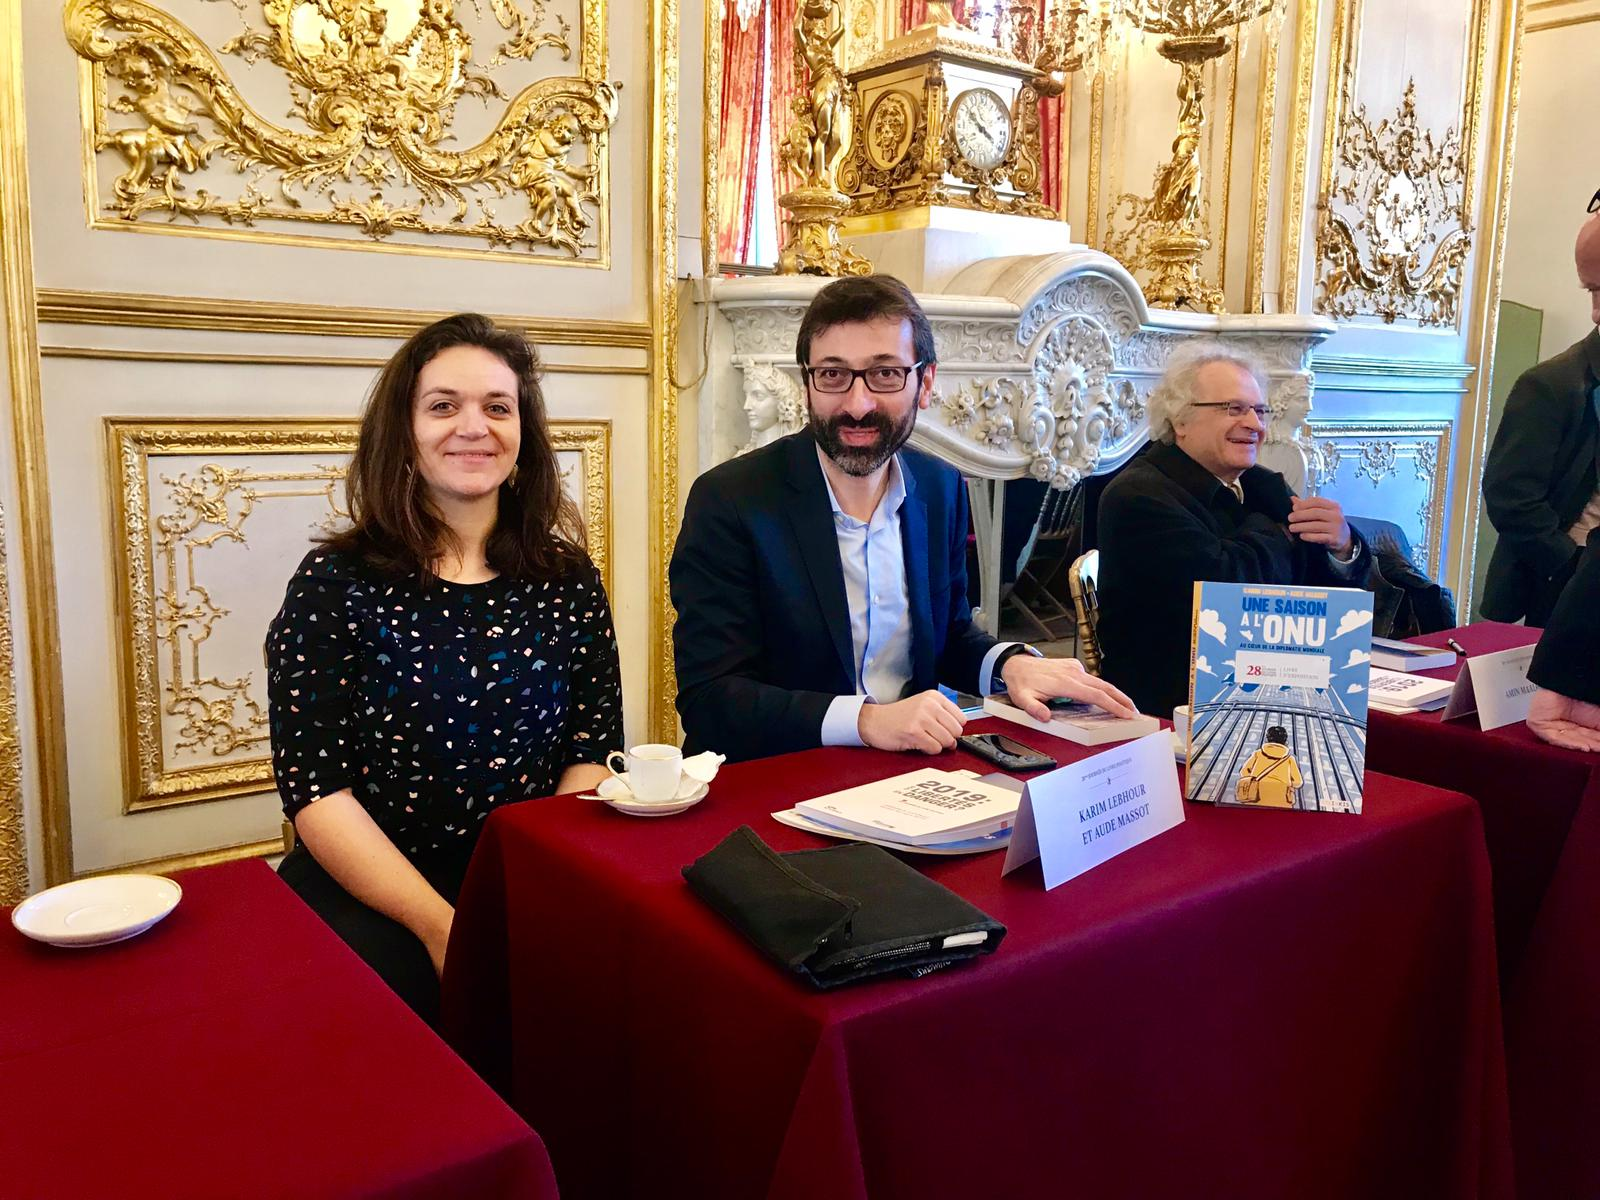 Karim Lebhour & Aude Massot.jpeg